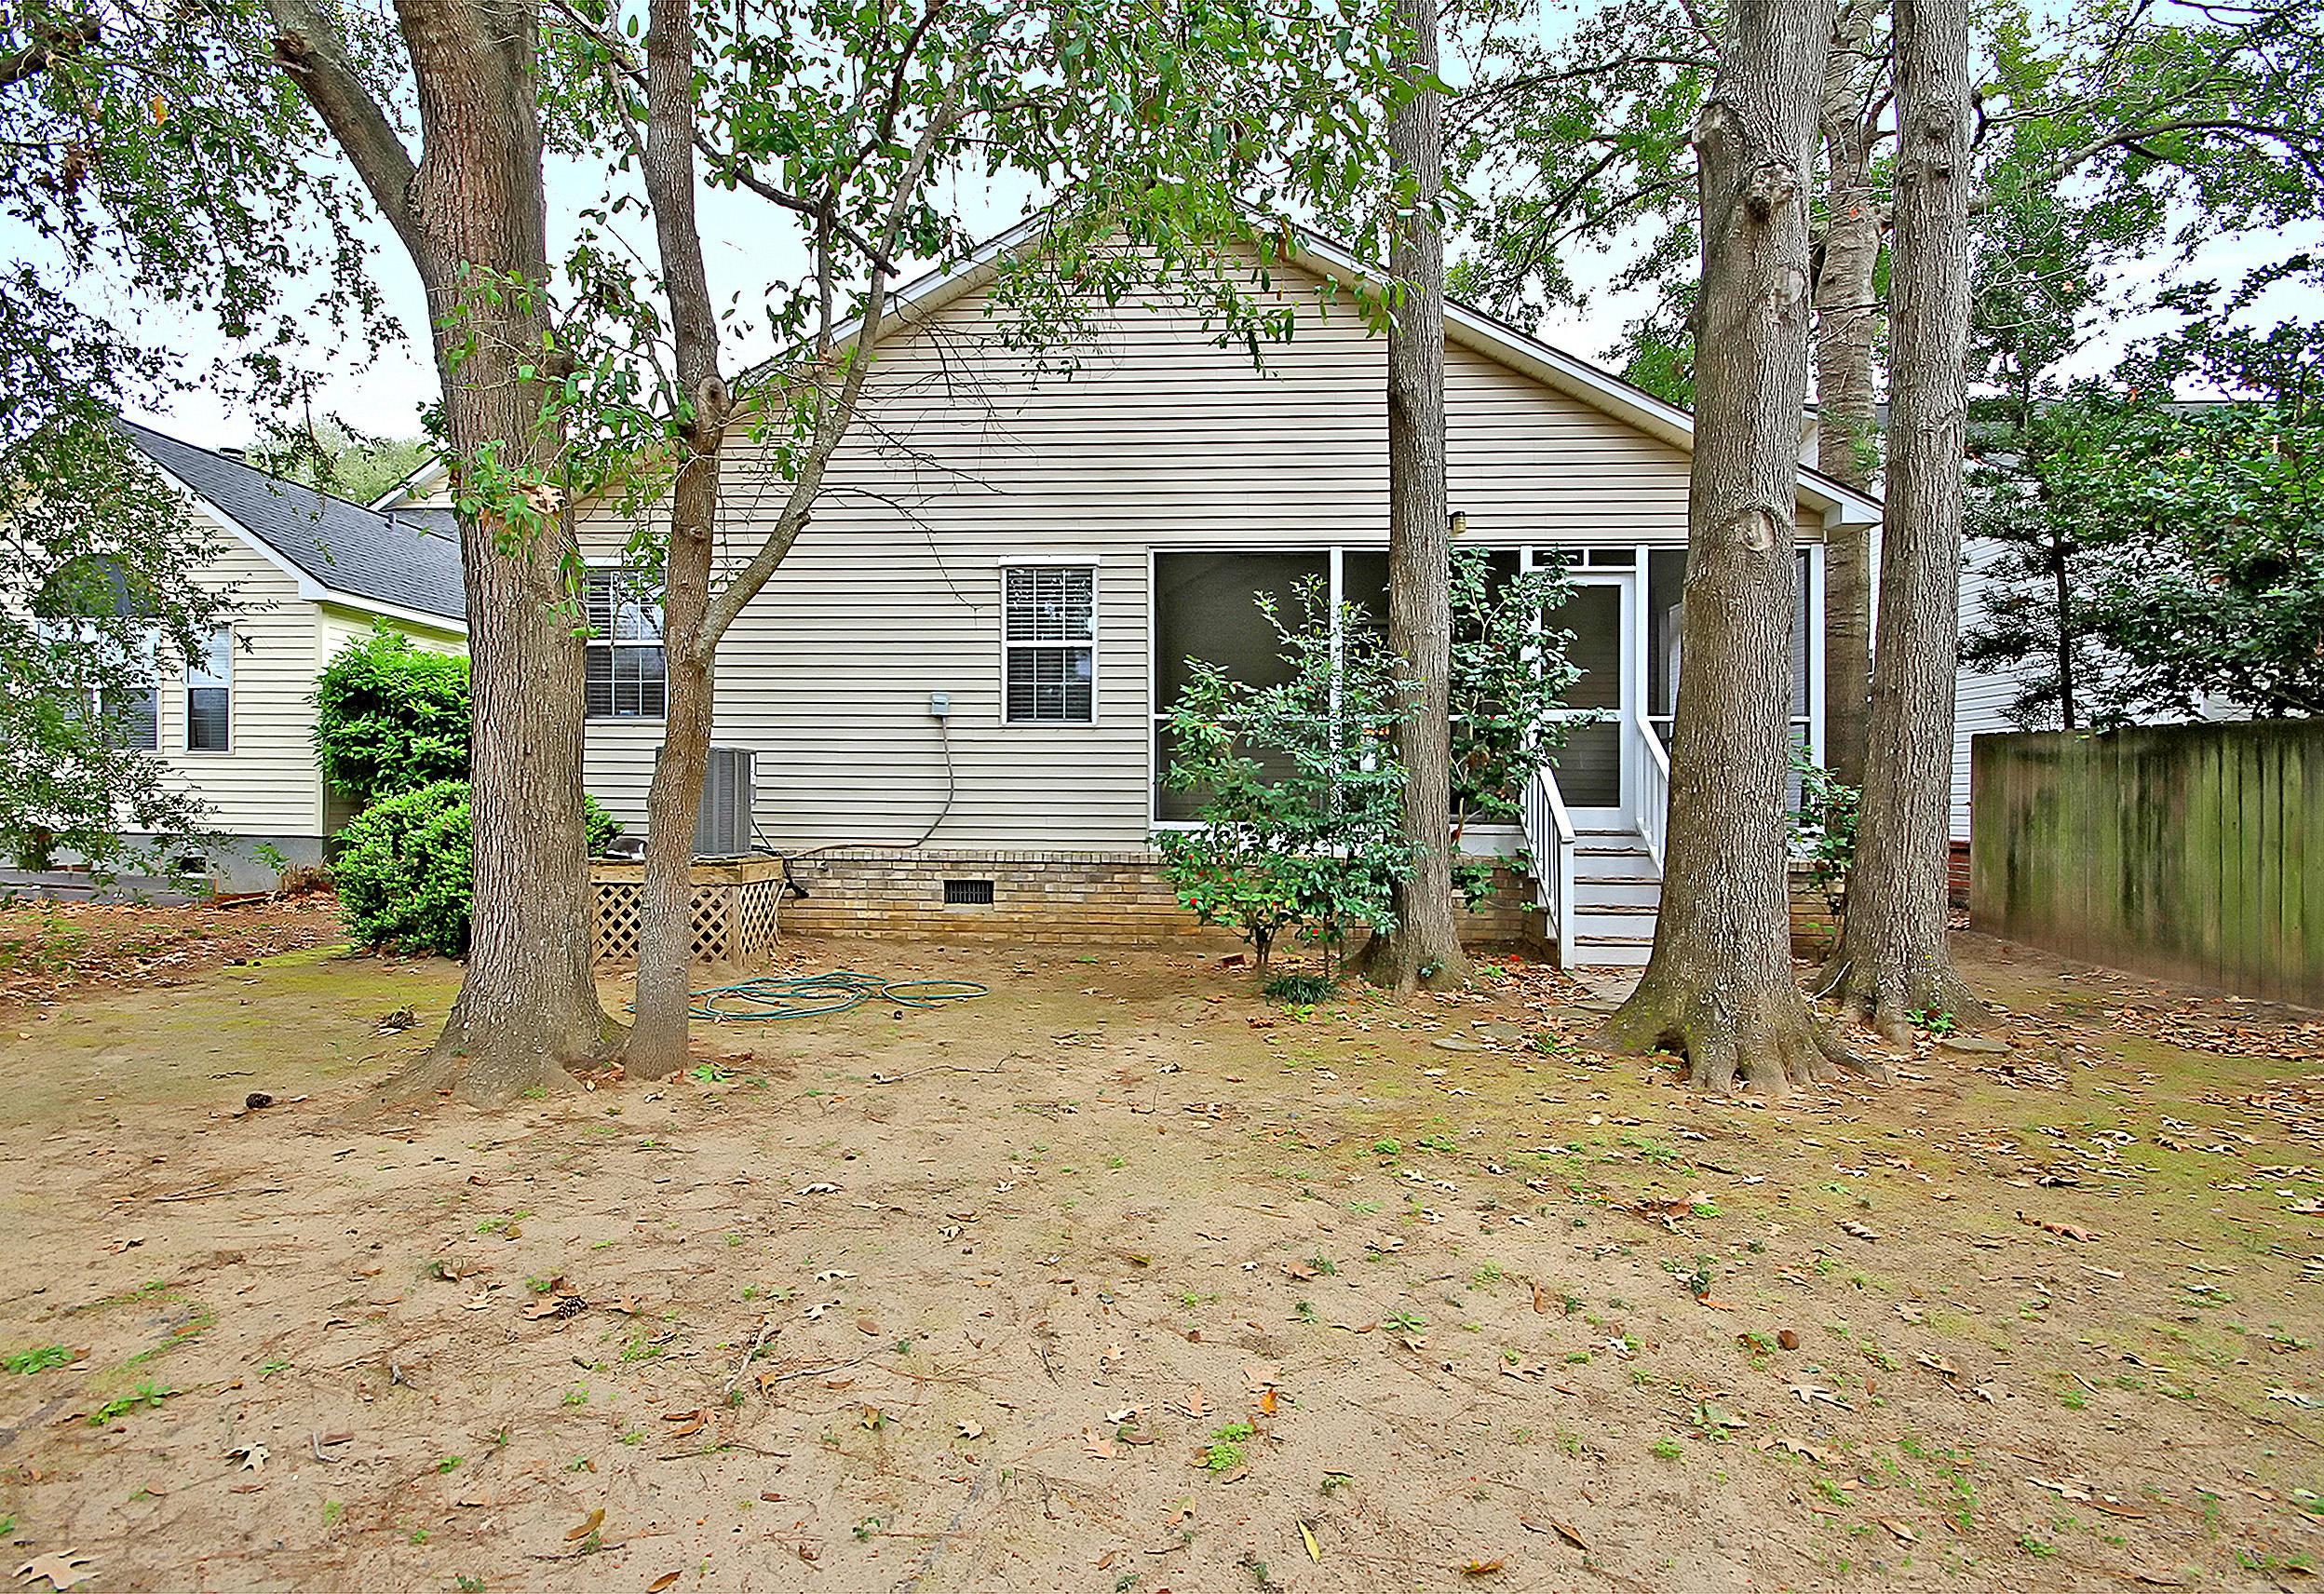 Harbor Place Homes For Sale - 845 Harbor Pl, Charleston, SC - 19